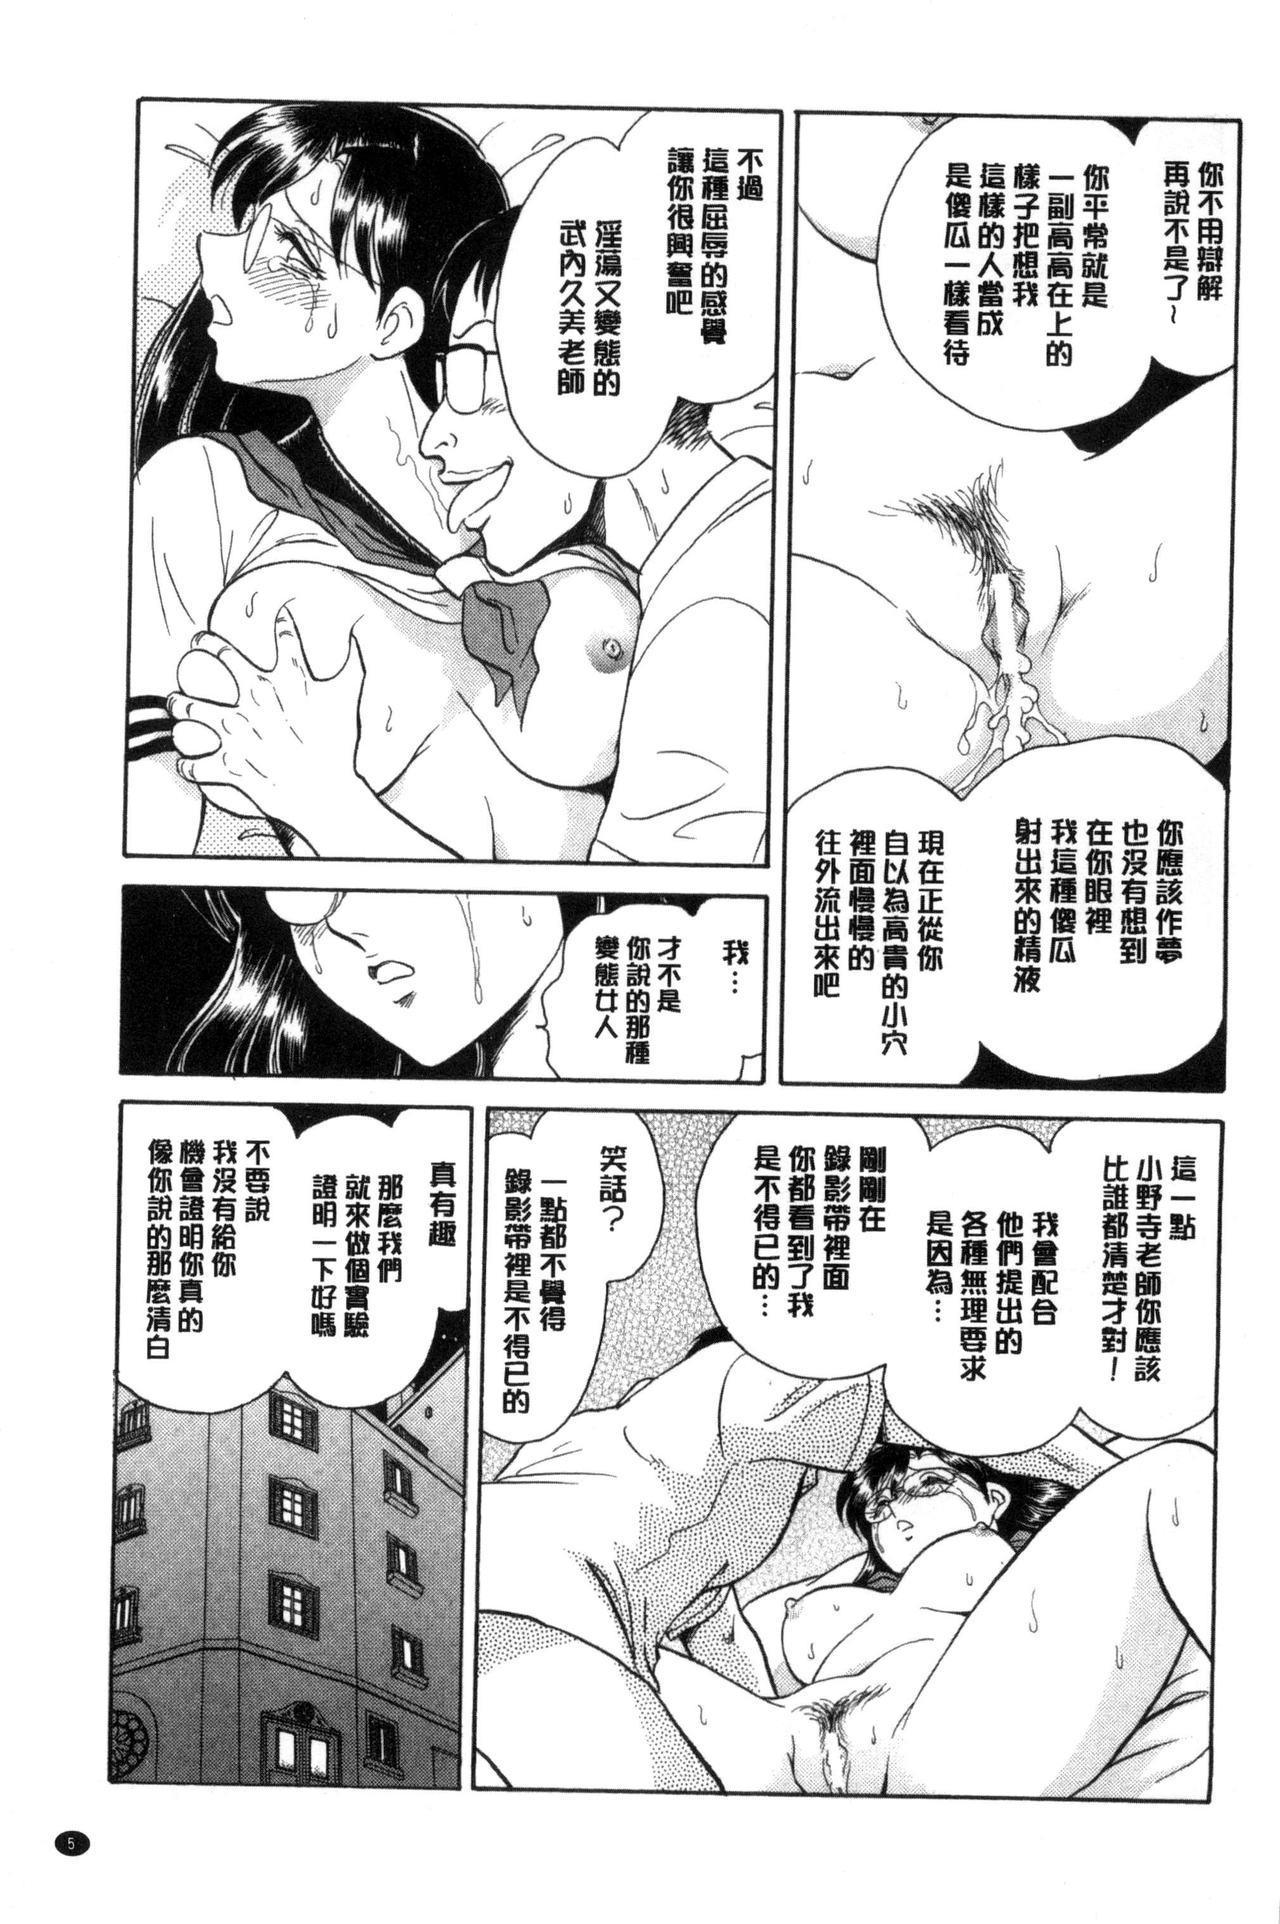 Hazukashii Kagai Jugyou | 害羞的課外授業 5